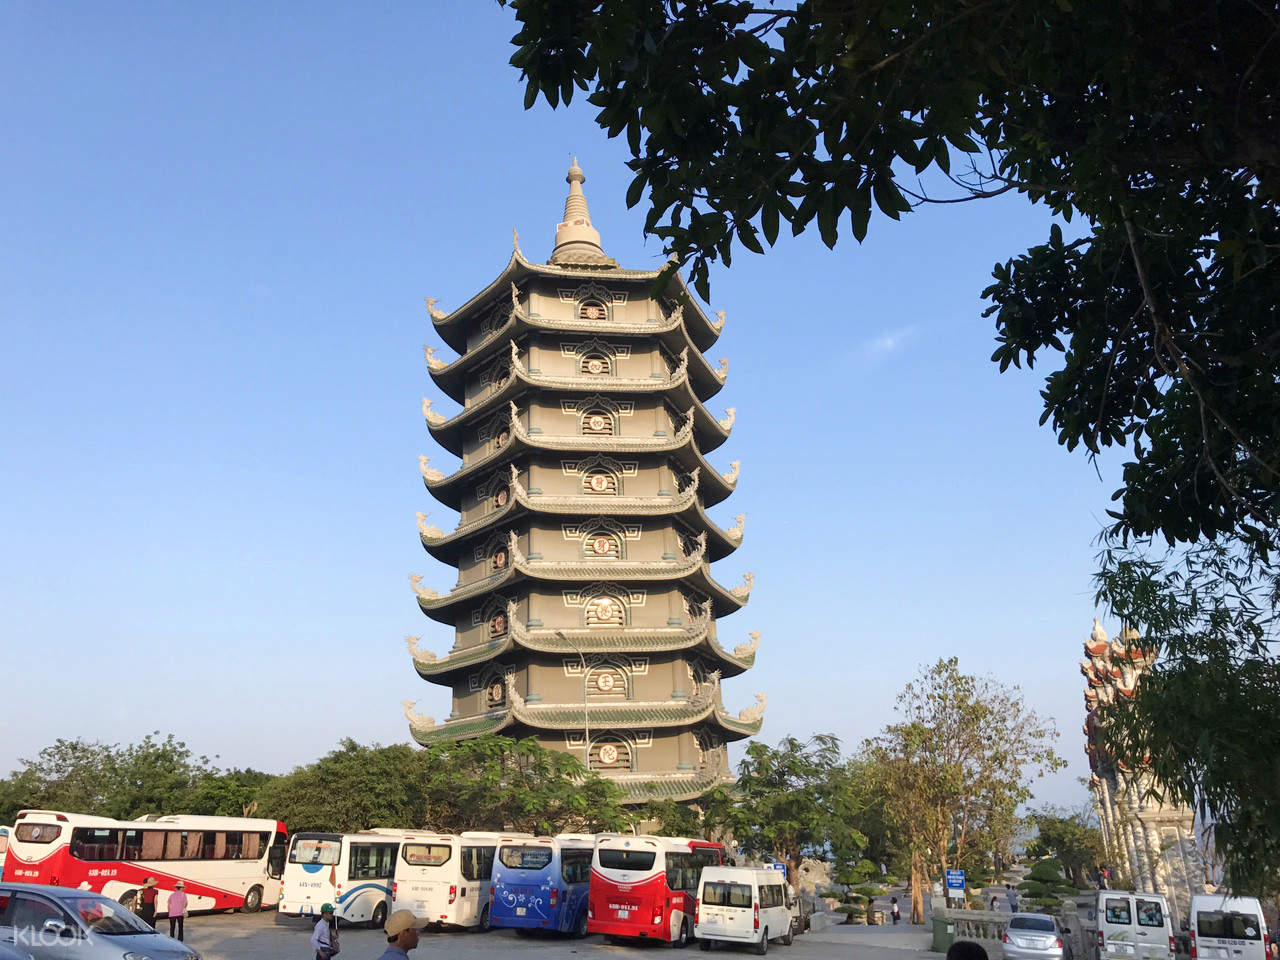 da nang tam thai pagoda tour